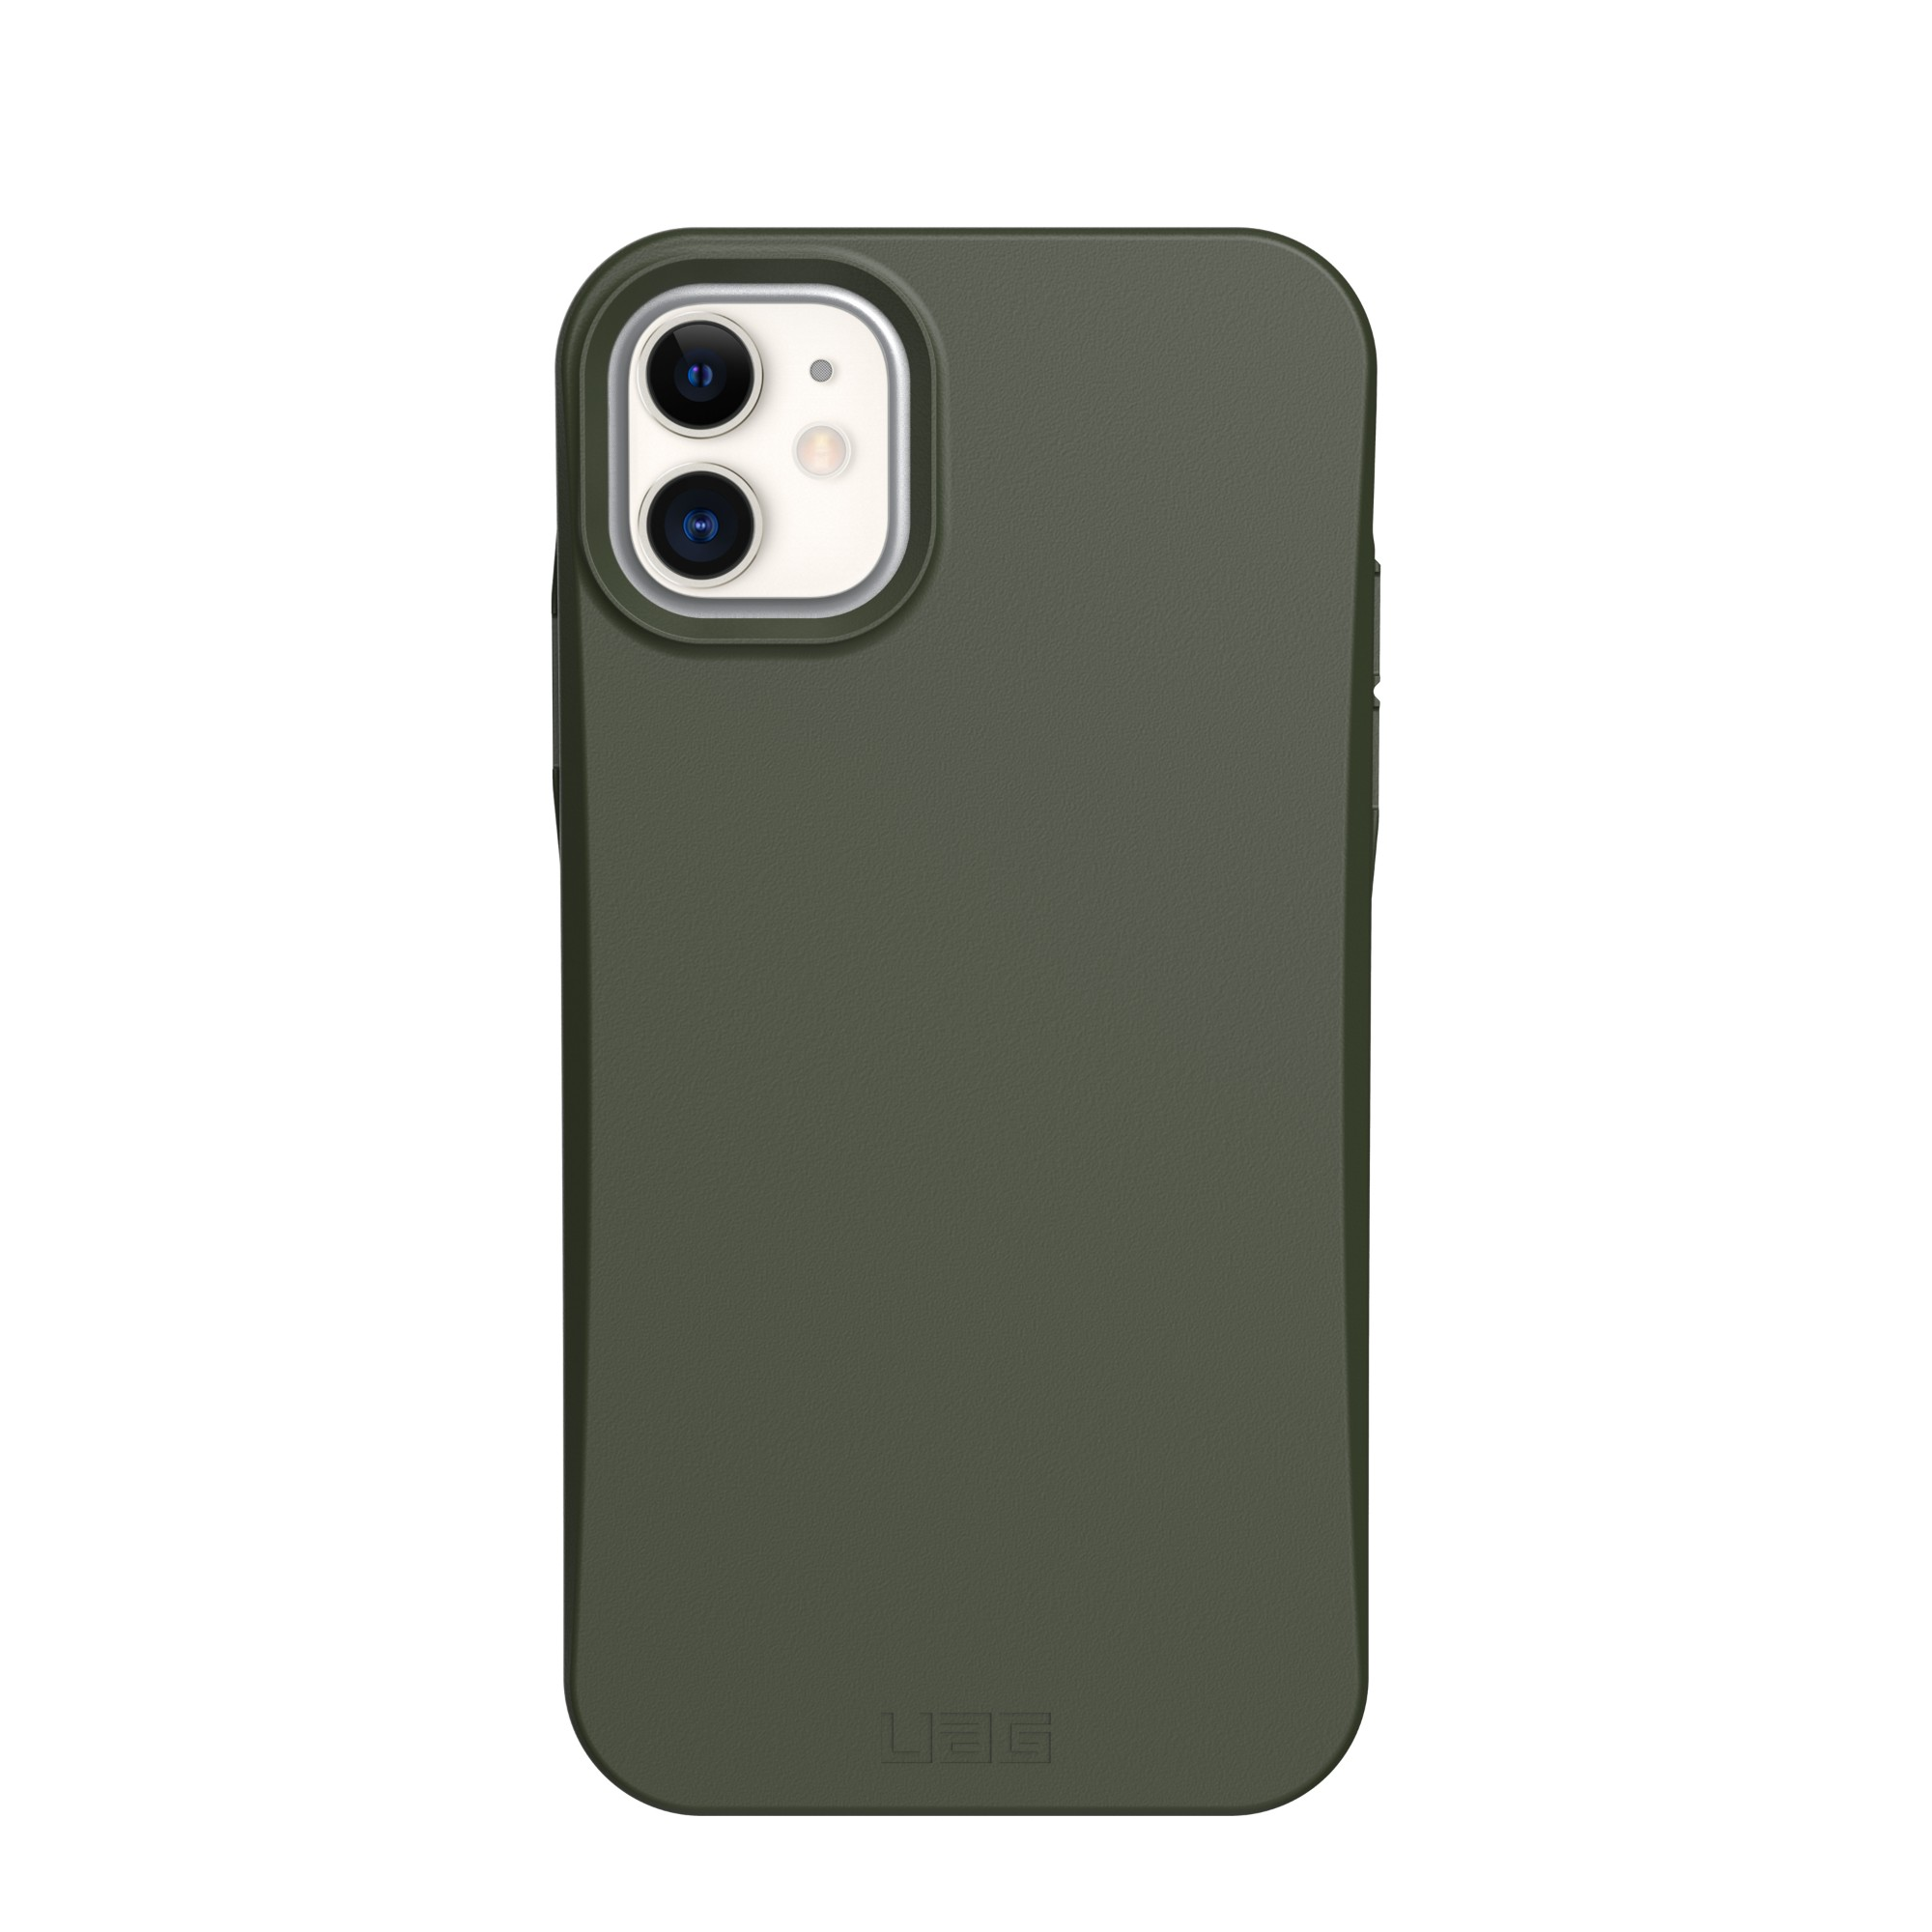 "Urban Armor Gear Biodegradable Outback funda para teléfono móvil 15,5 cm (6.1"") Oliva"